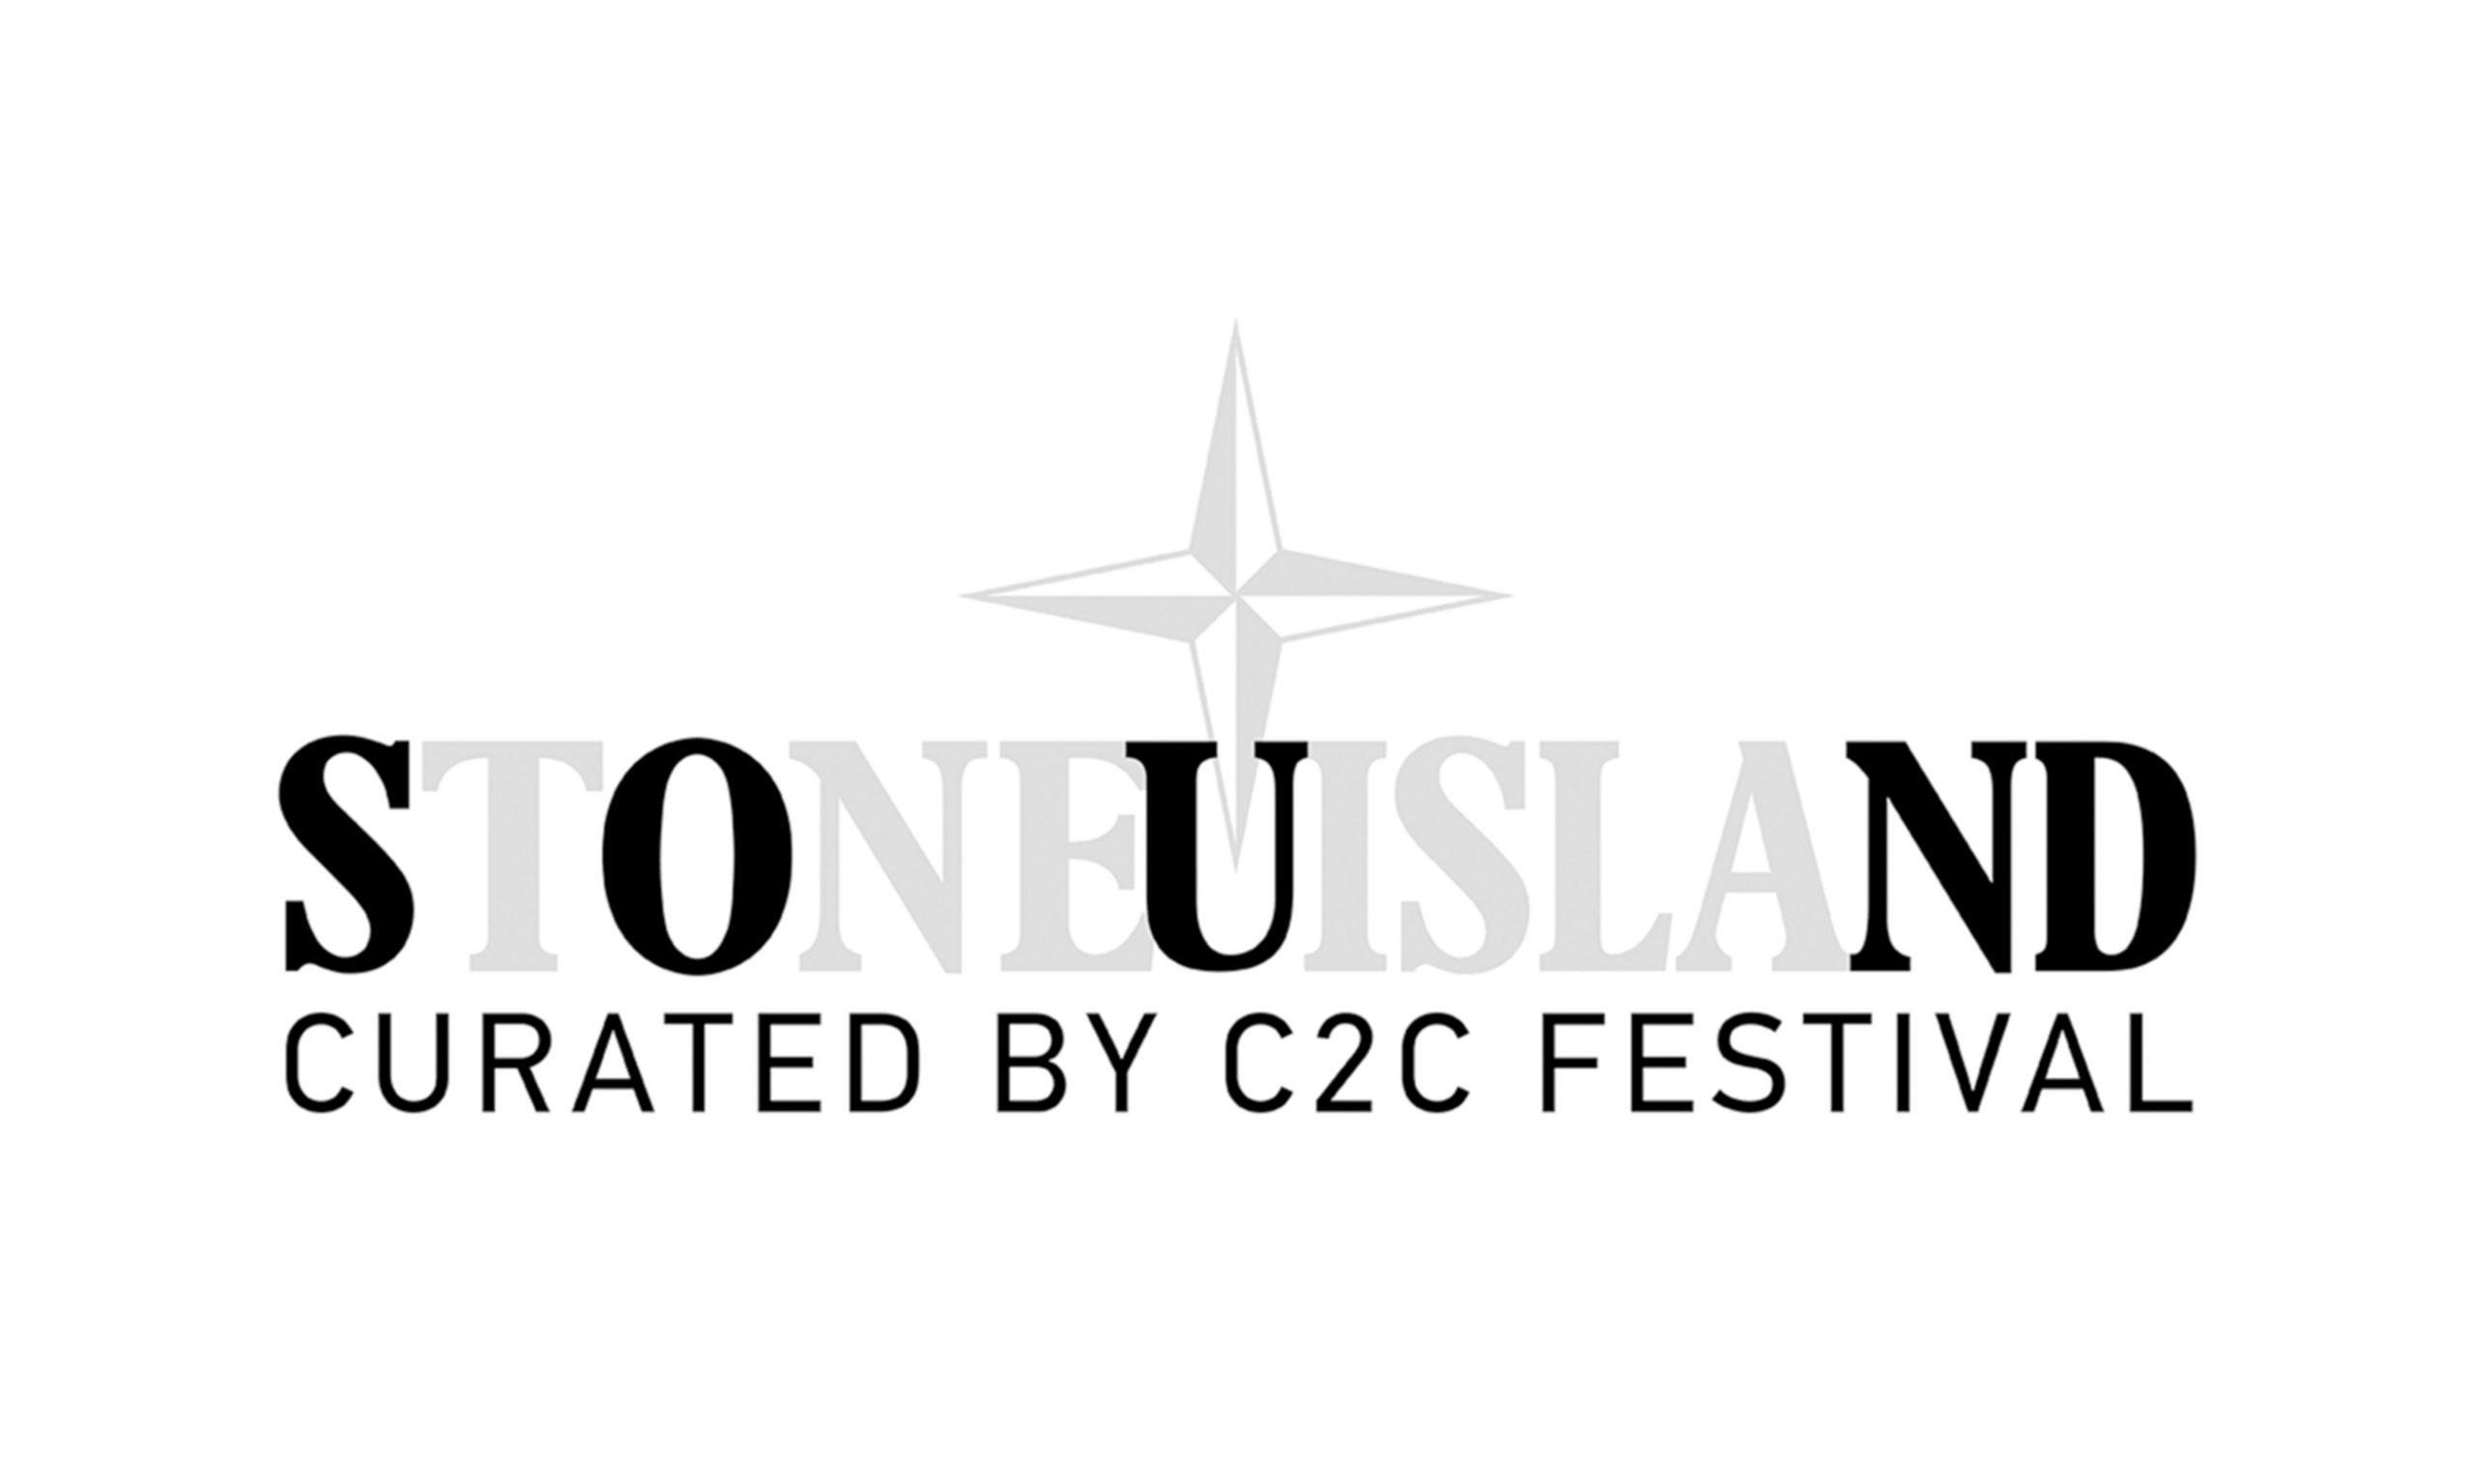 Stone Island 联手 C2C 音乐节推出全新合作项目